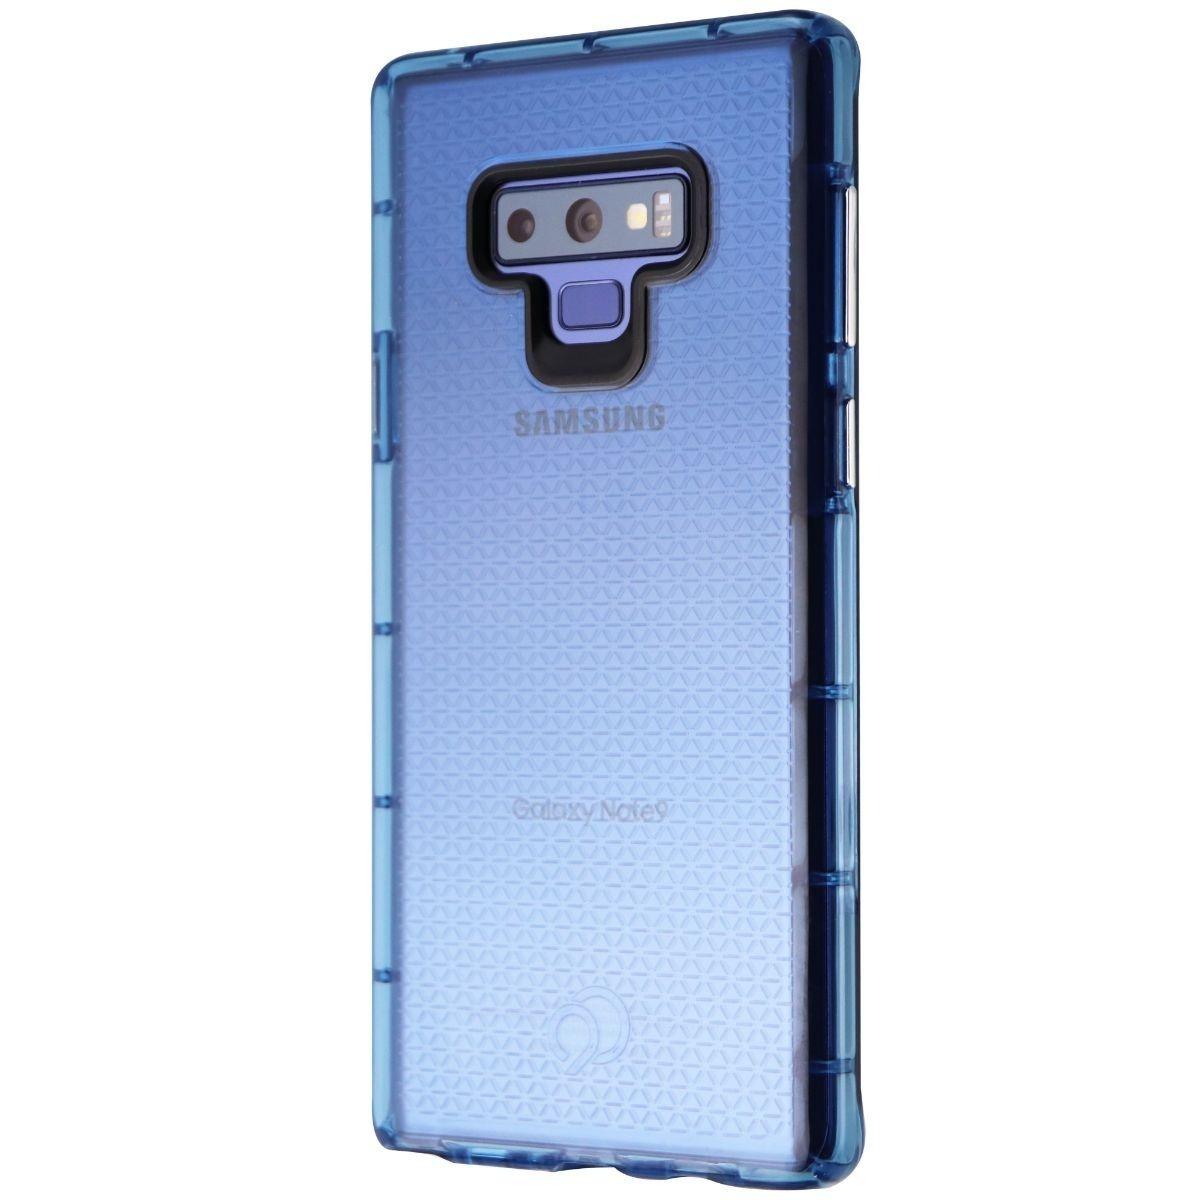 Nimbus9 Phantom 2 Case for Samsung Galaxy Note 9 - Pacific Blue